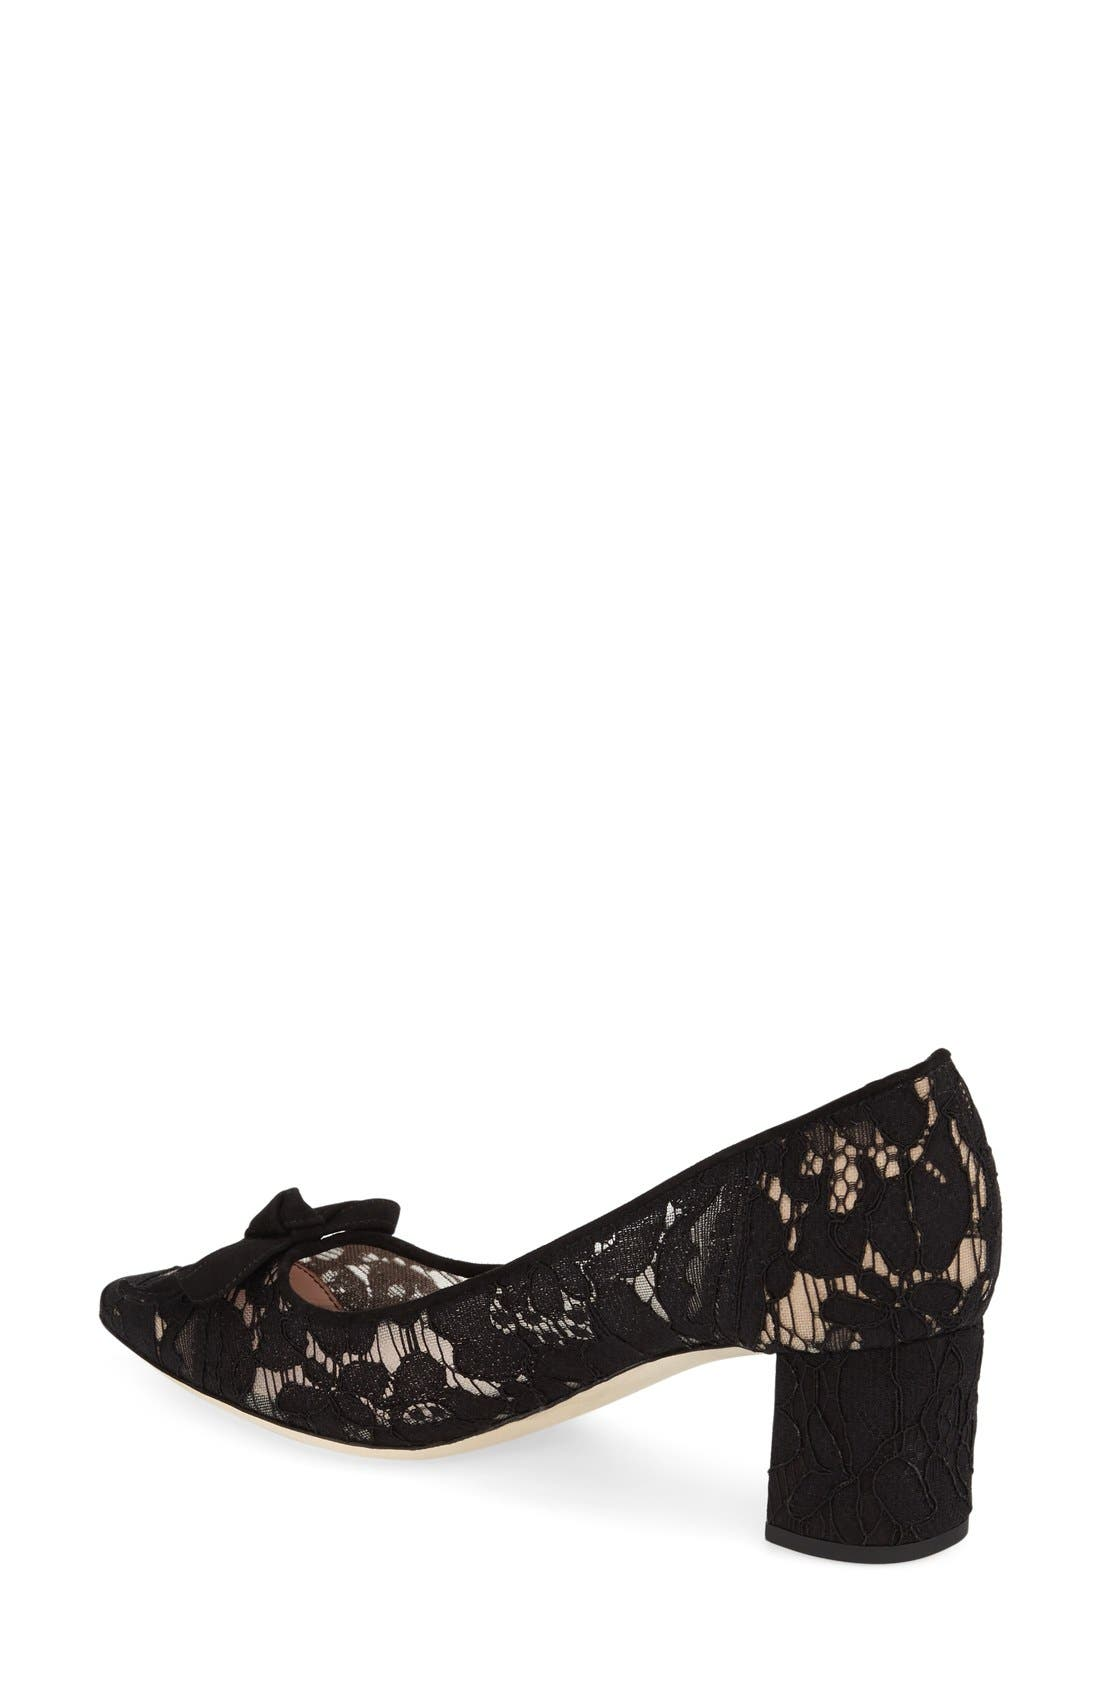 Alternate Image 2  - kate spade new york 'madelaine' block heel pump (Women)